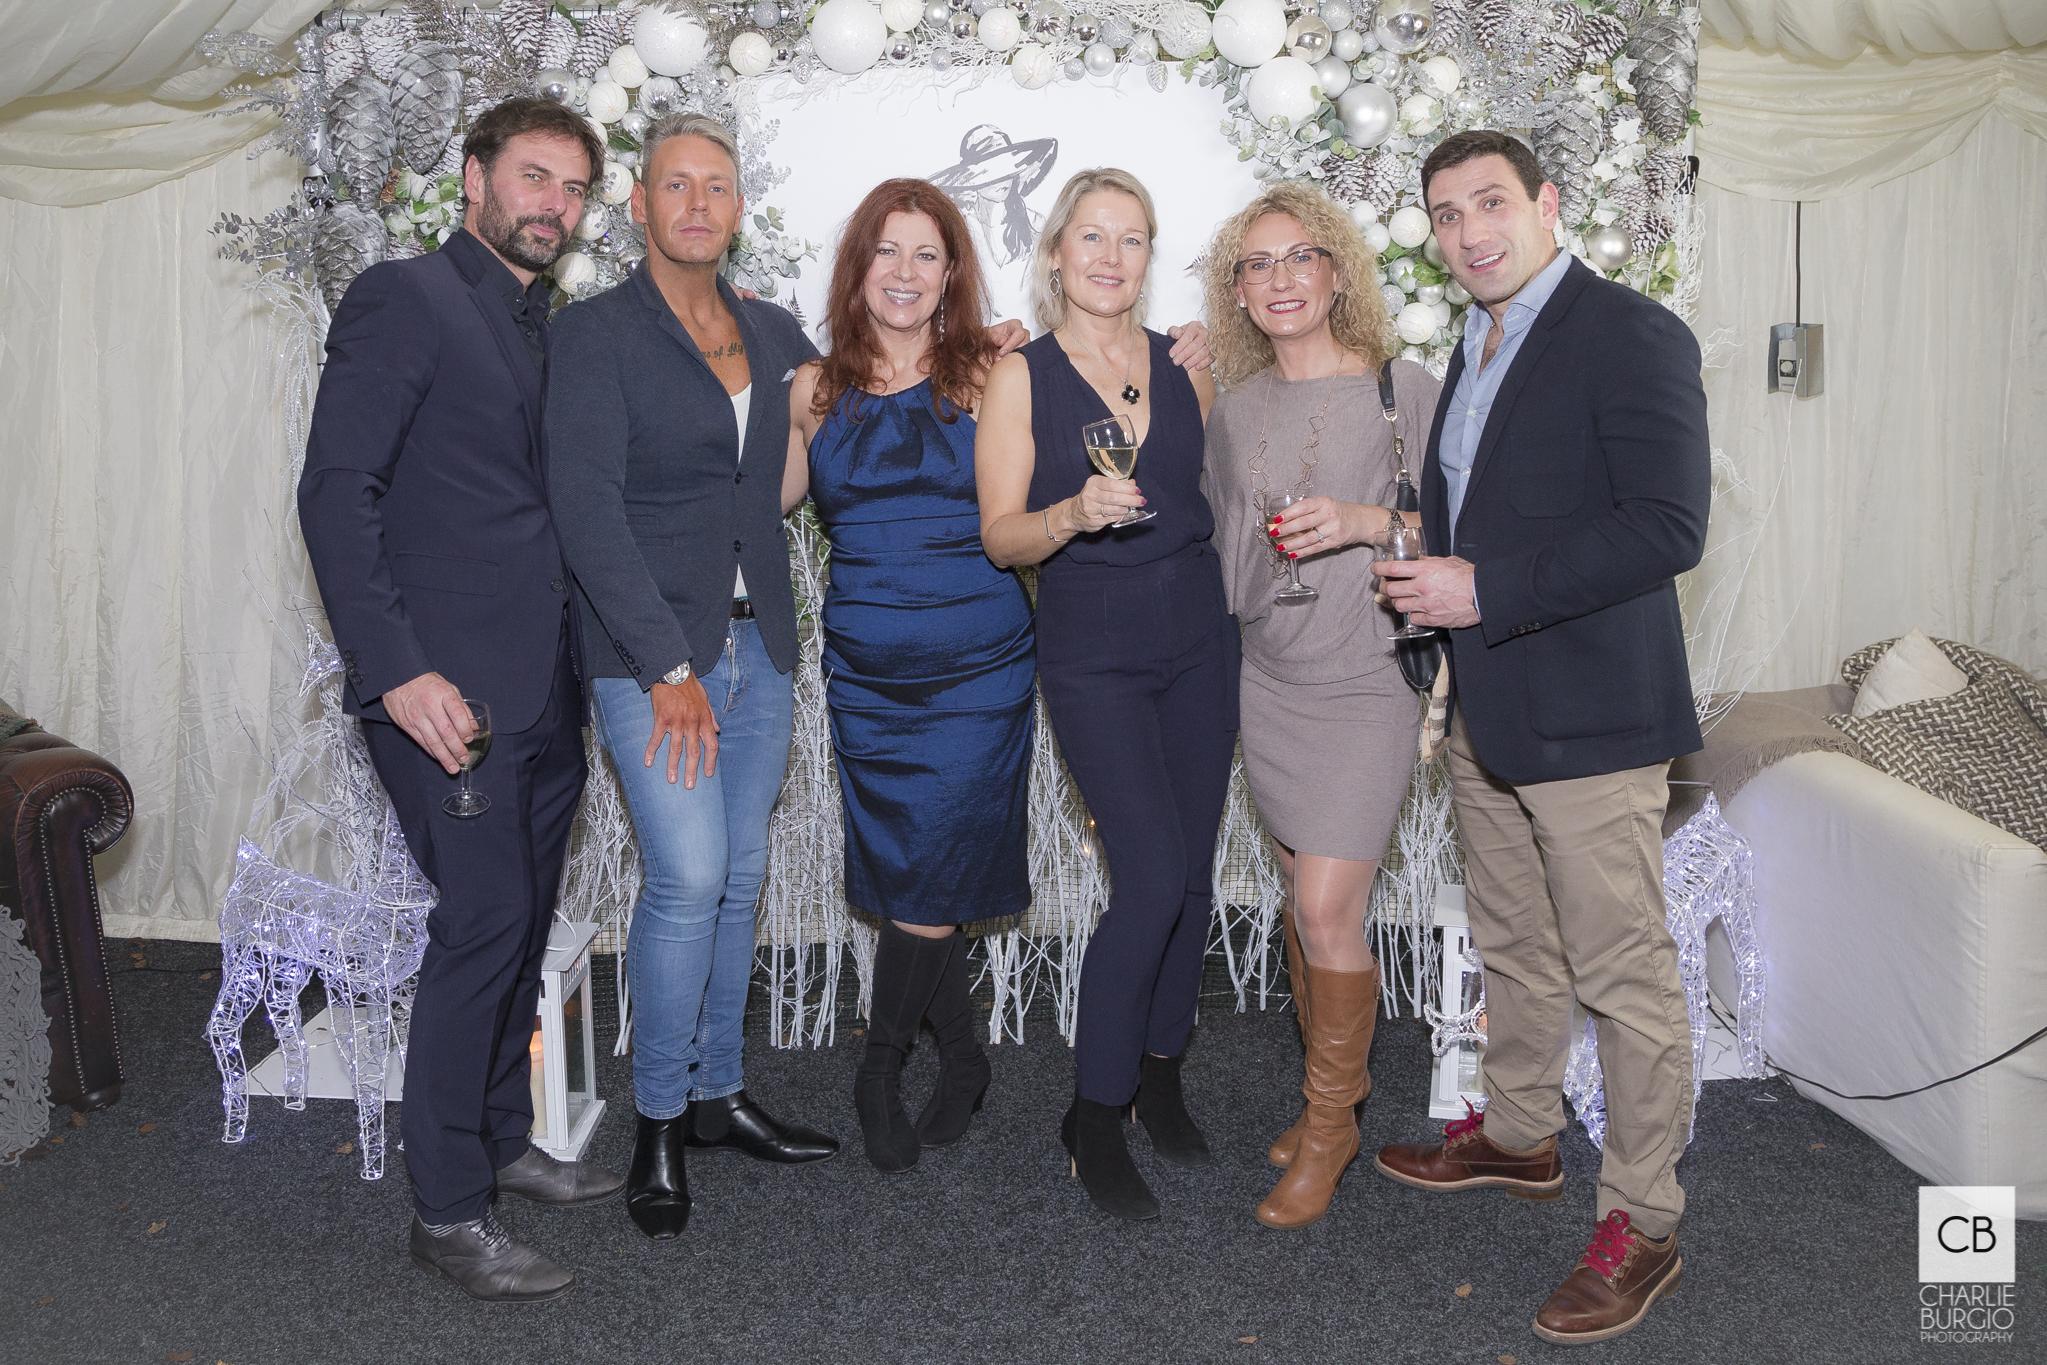 Lady Wimbledon, Trafalgar Marquee, Mr Sparx, Partica, Grant Bickell, Karine Torr, Marja-Leena Toseland, Darling Magazine